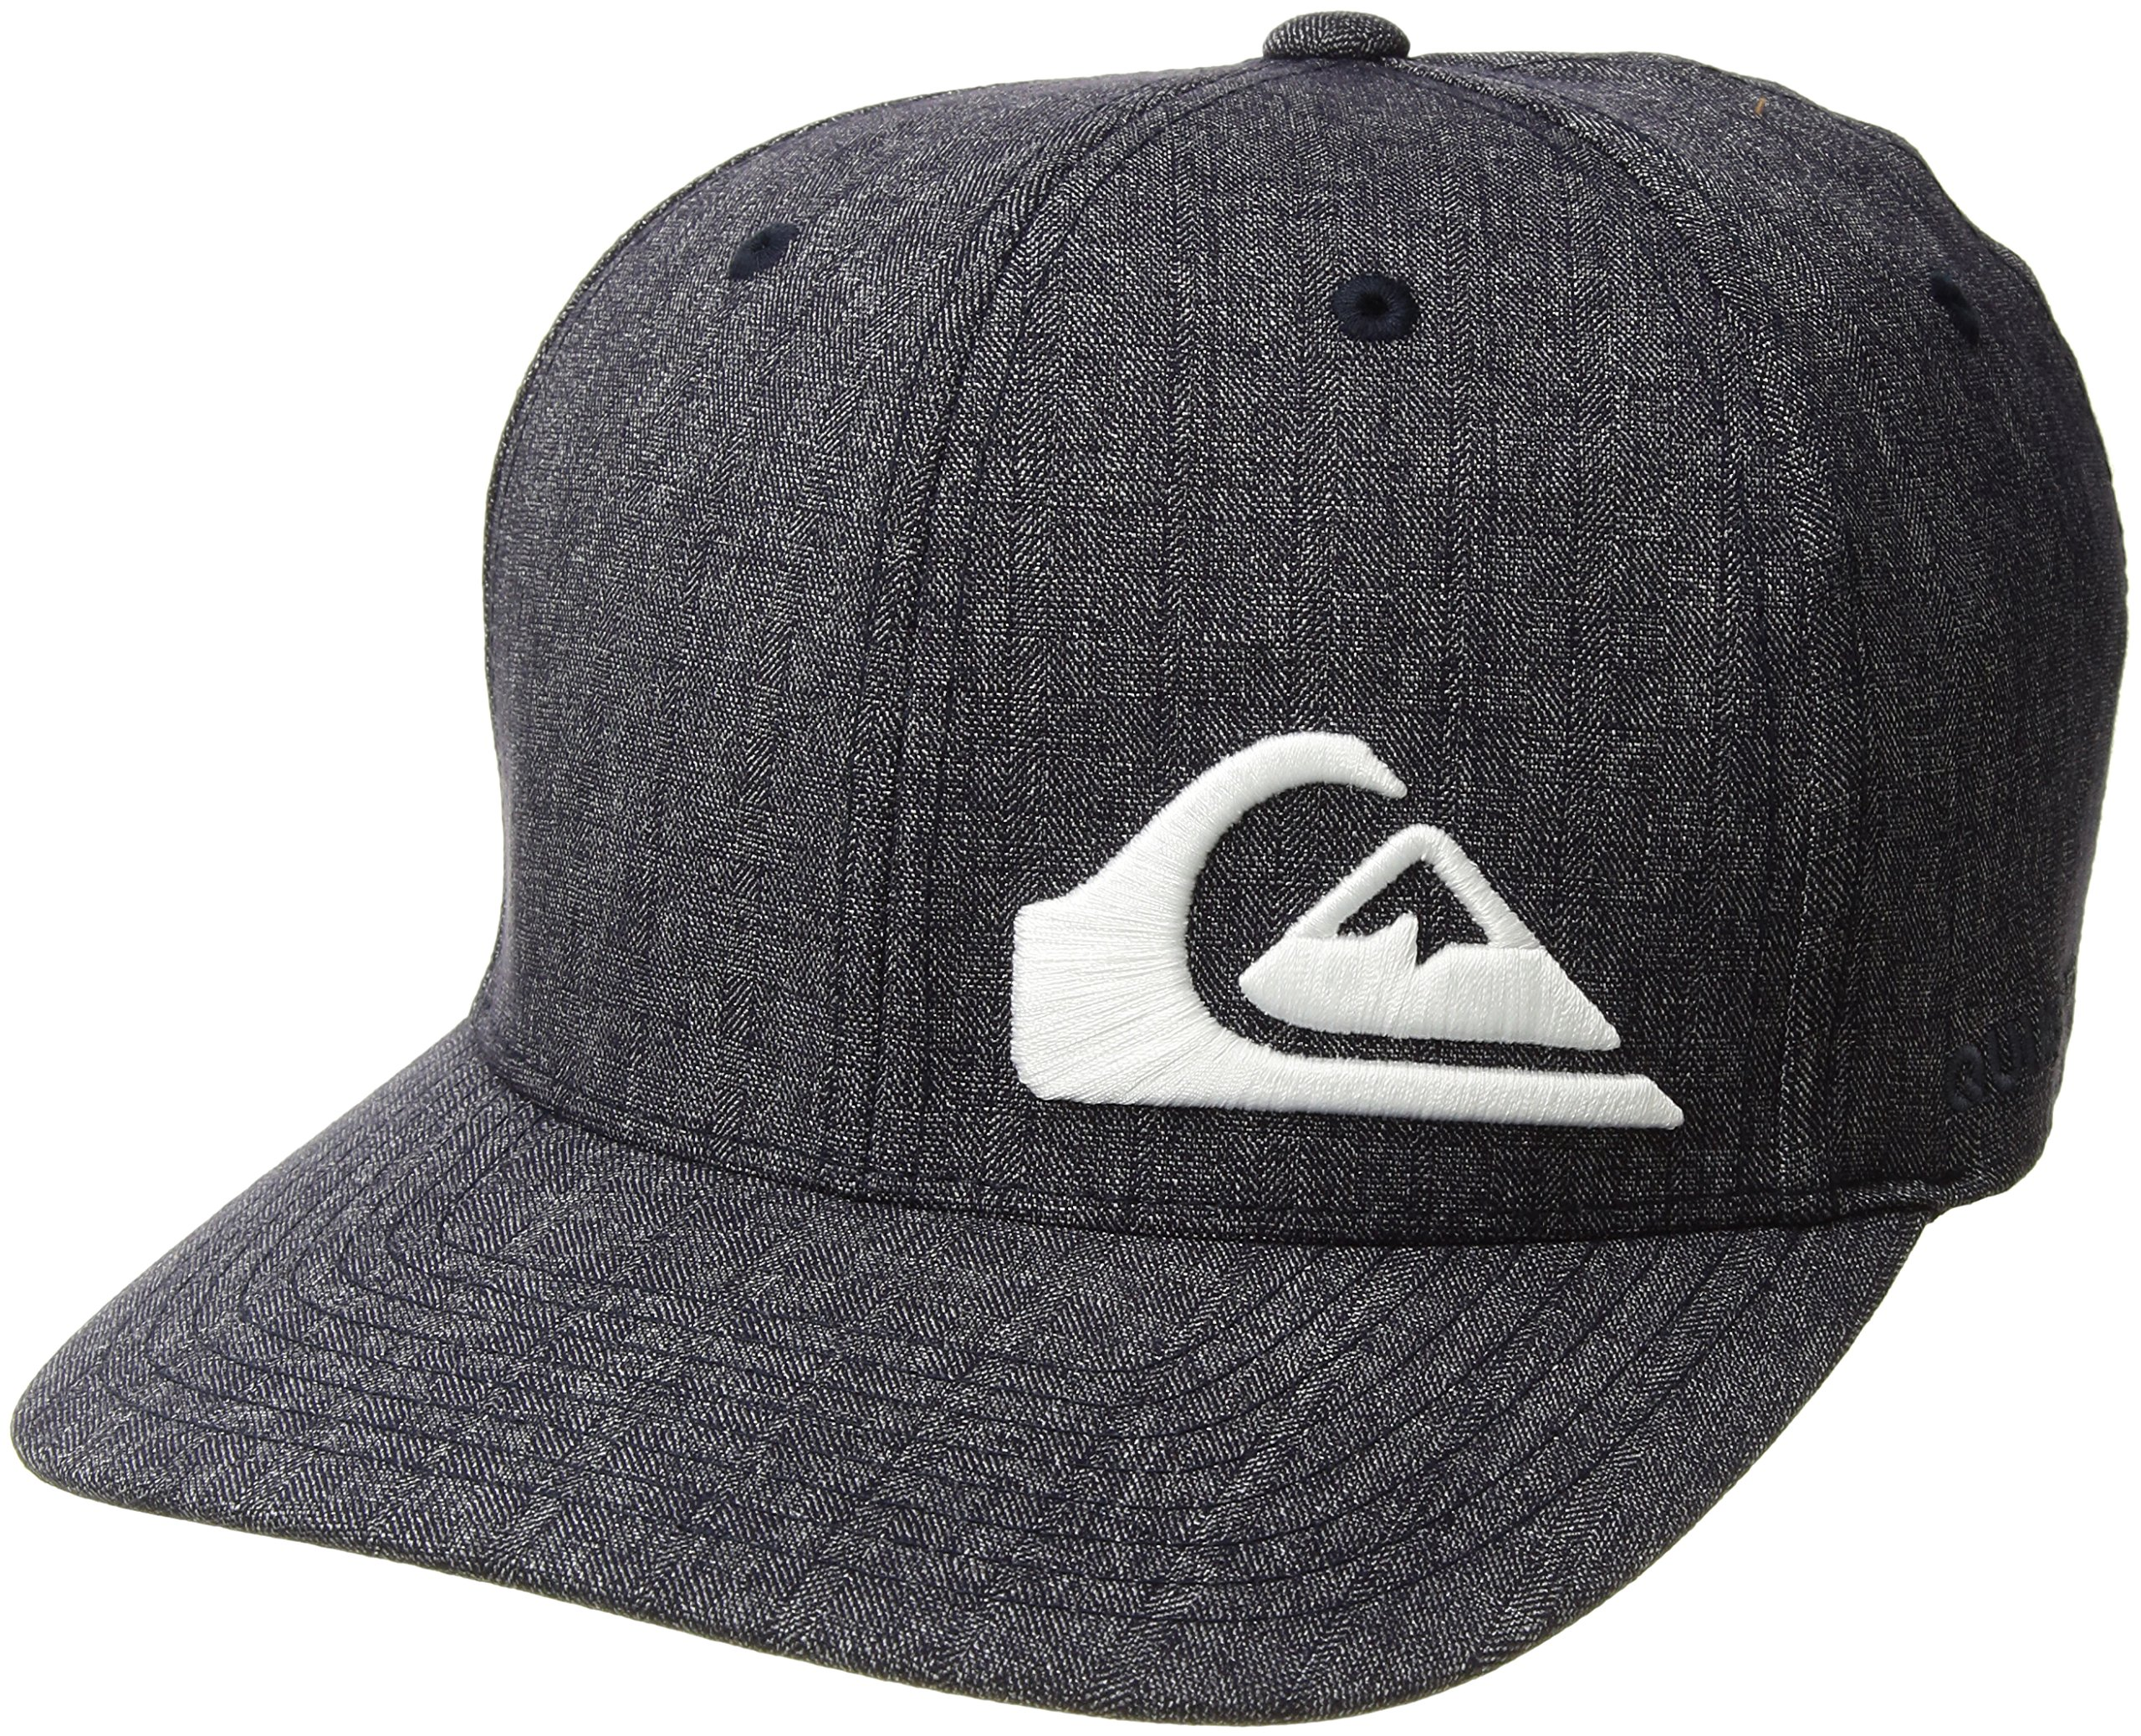 Quiksilver Men's Final Hat, Navy Blazer Heather, L/XL